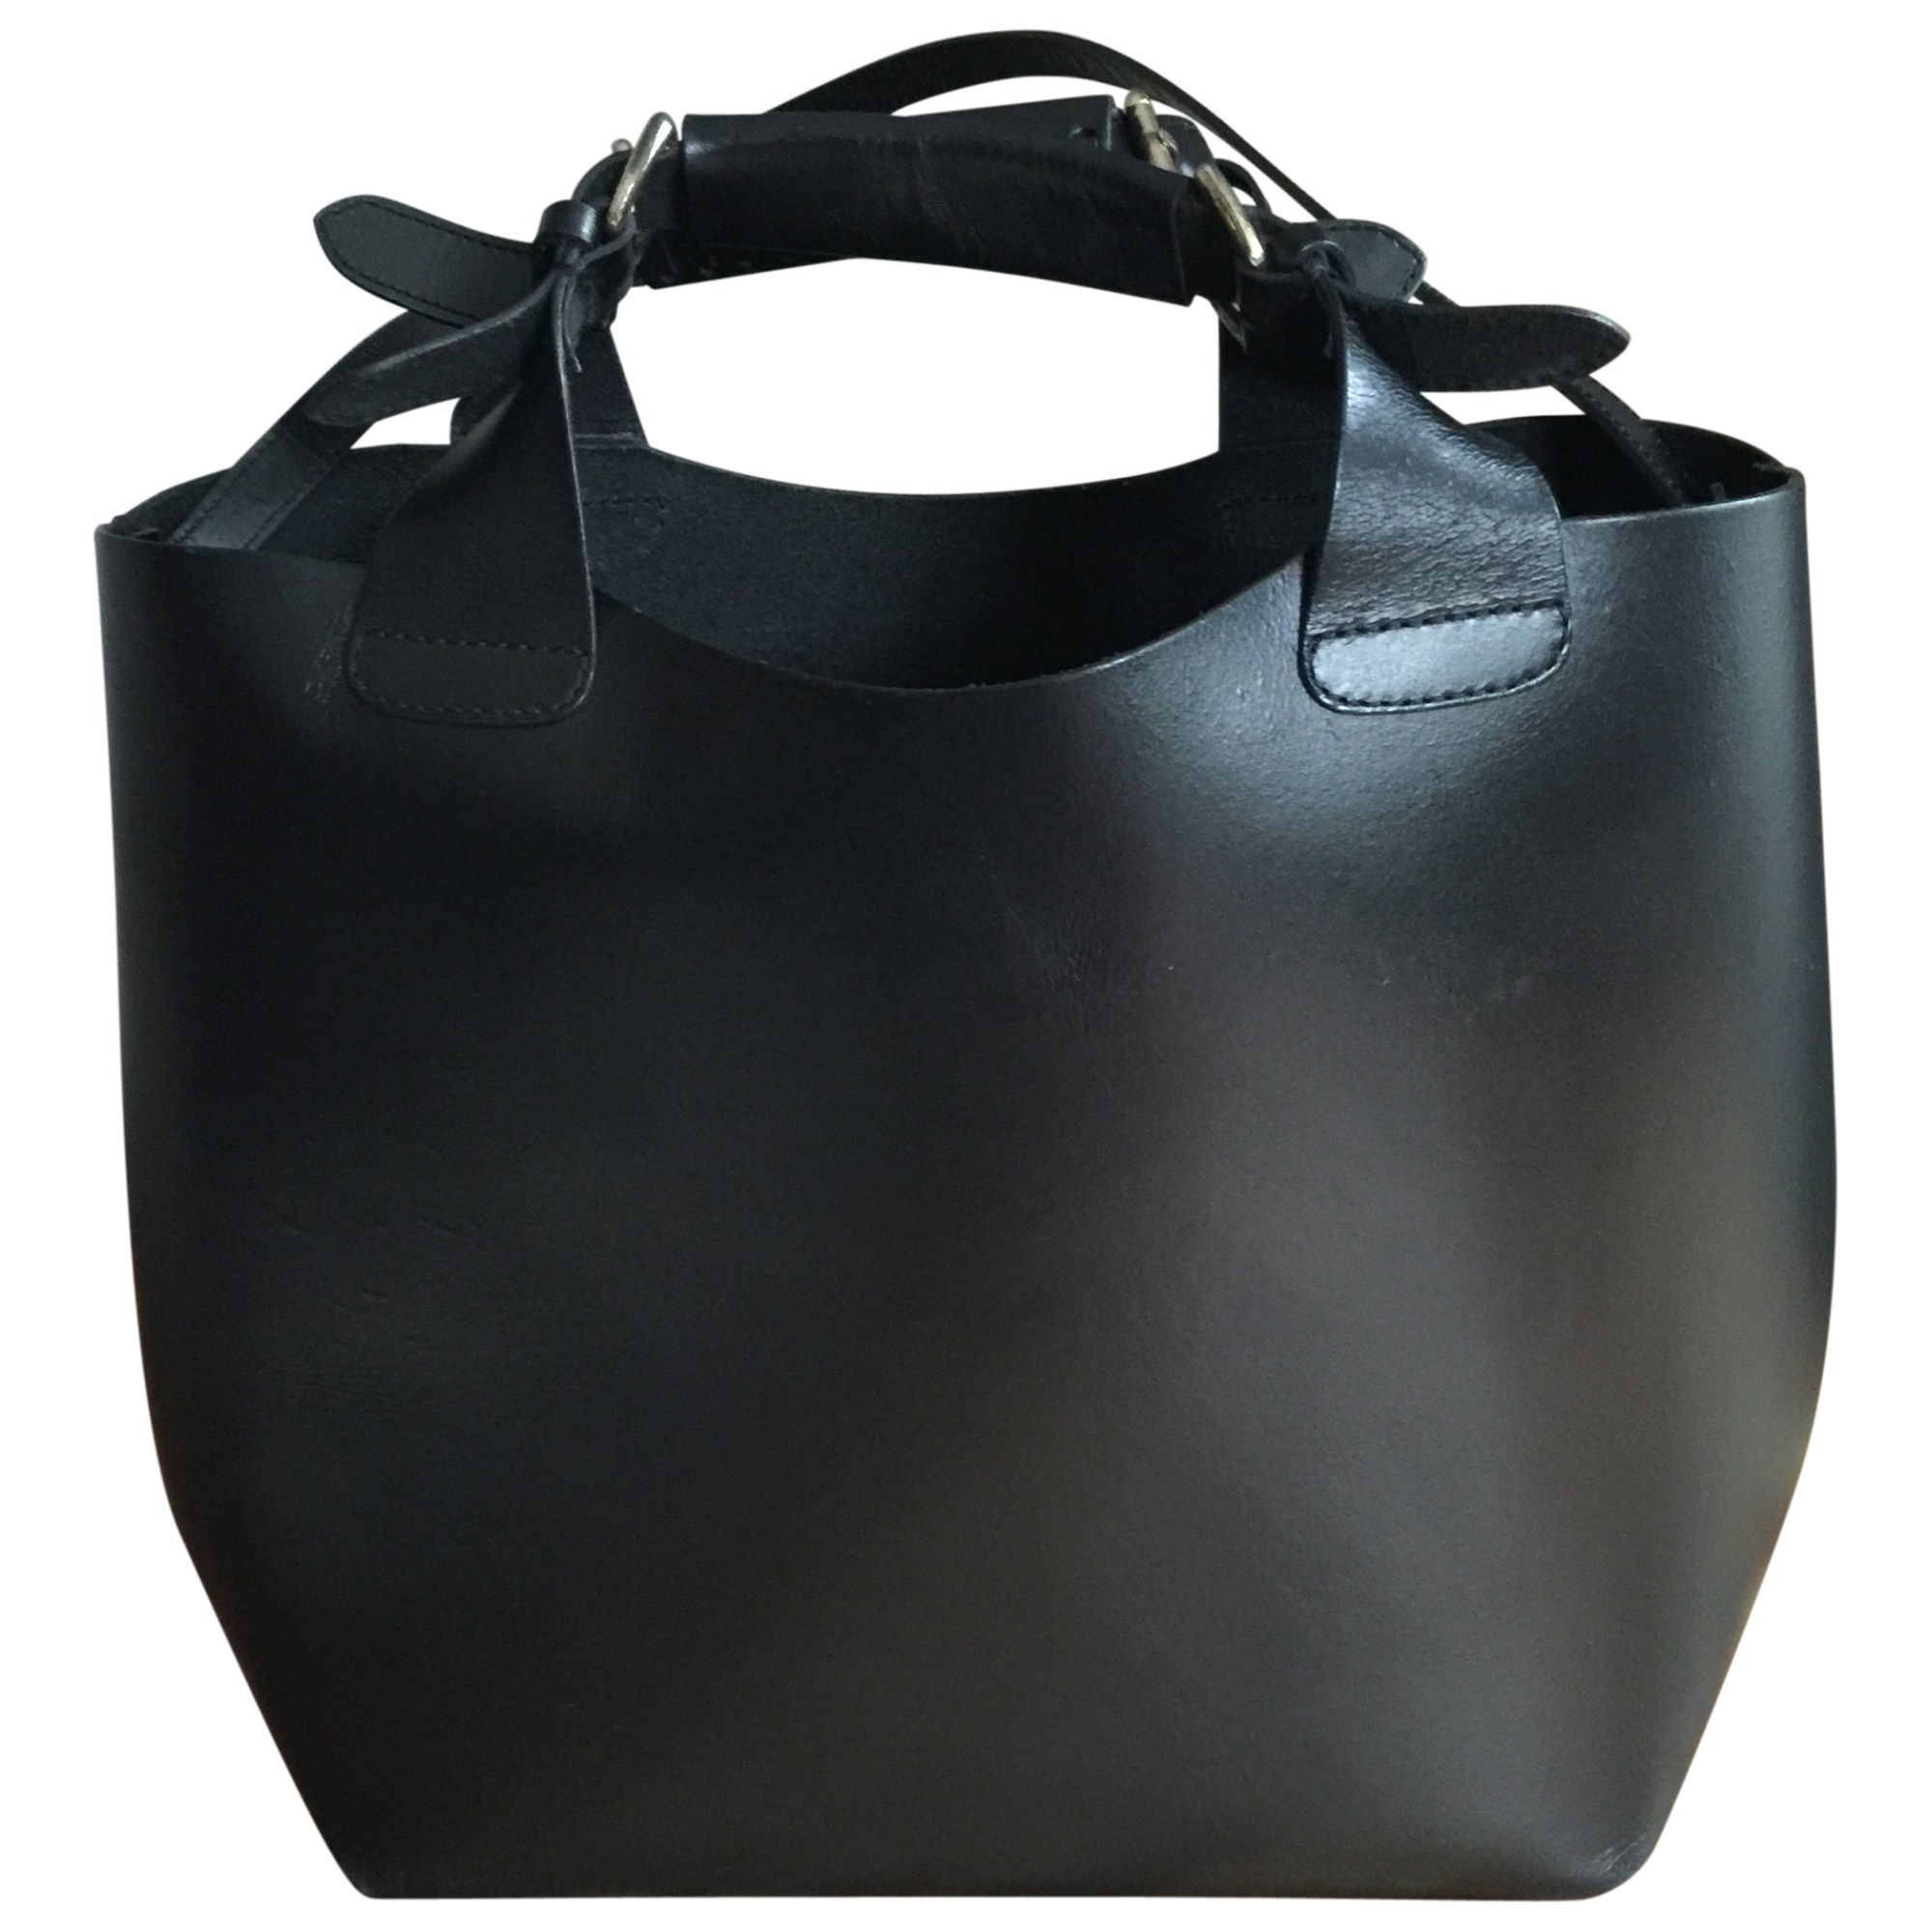 sac main en cuir zara noir vendu par manon0509 4114651. Black Bedroom Furniture Sets. Home Design Ideas